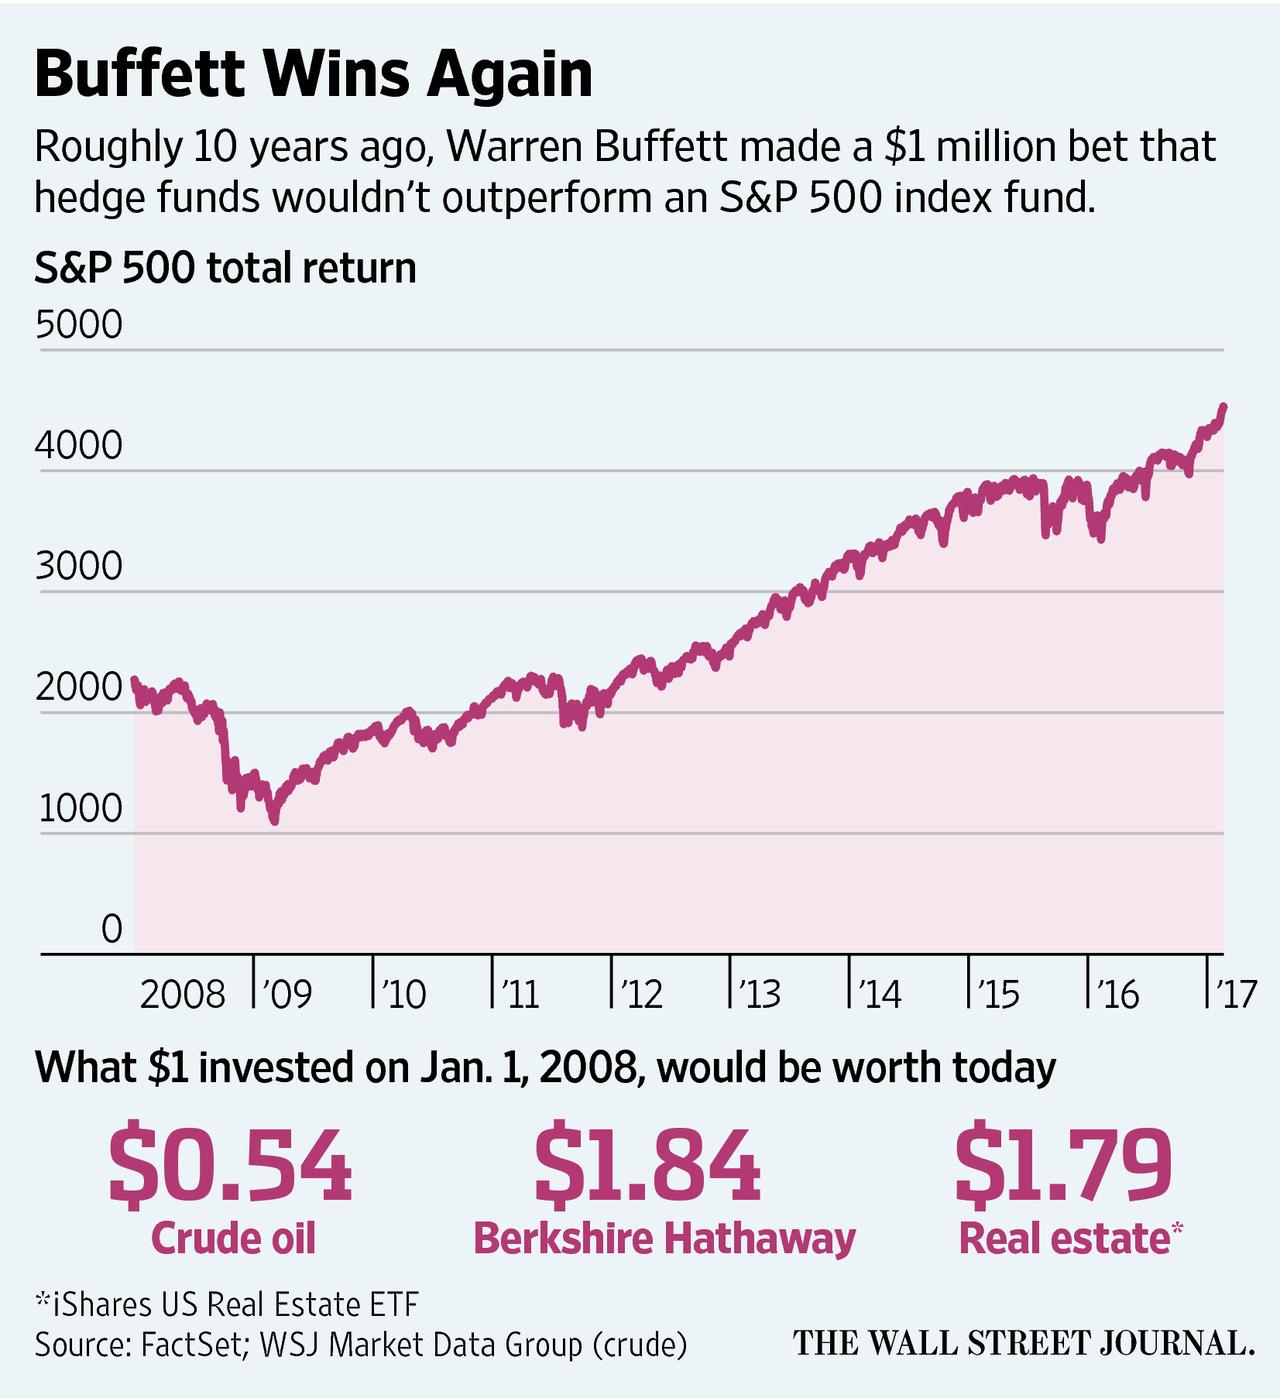 buffett hedge fund bet 2019